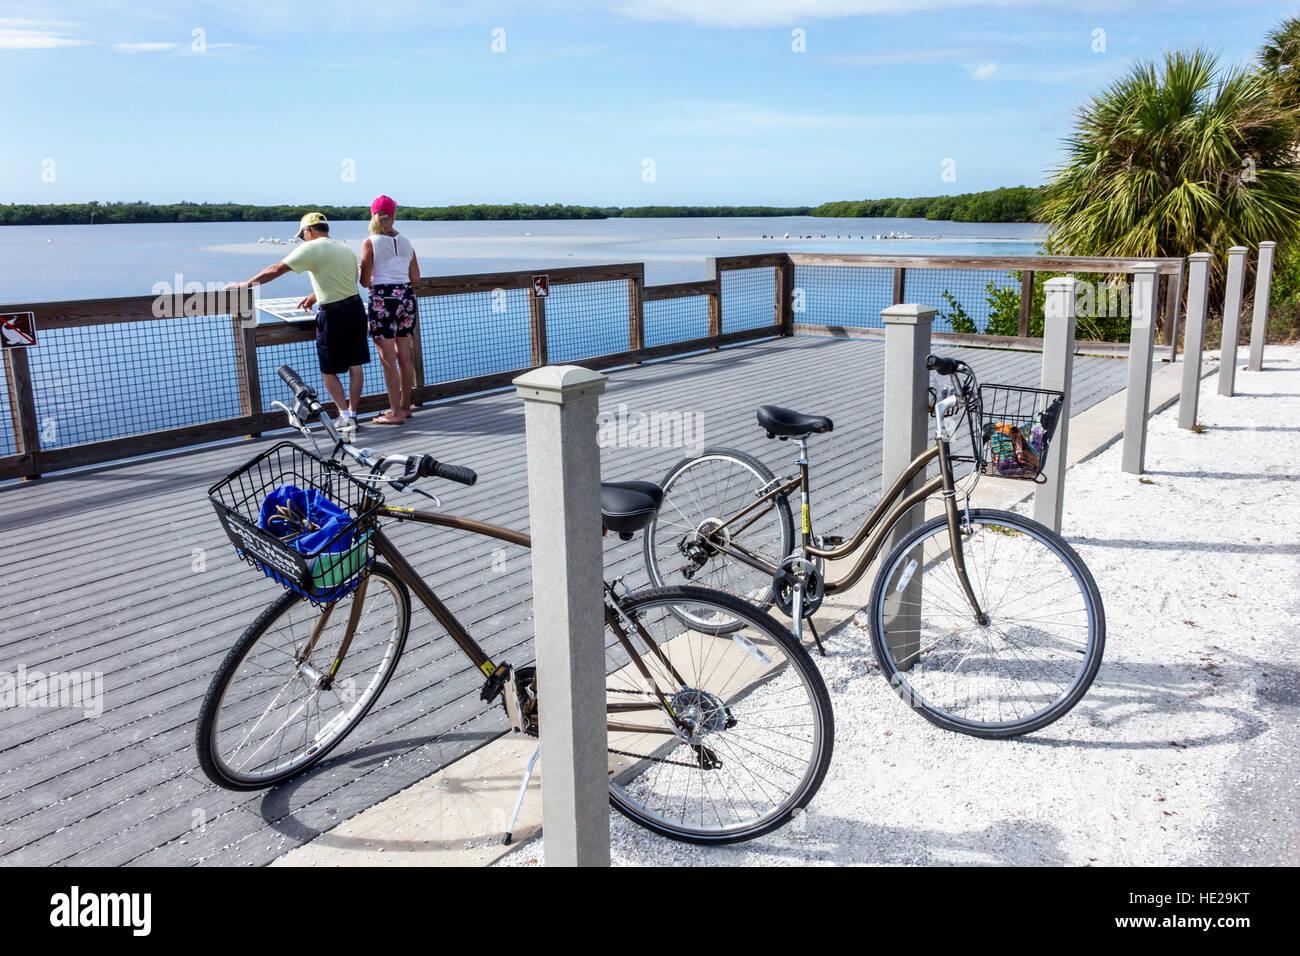 Sanibel Island Florida J. N. J.N. JN Ding Darling National Wildlife Refuge man woman couple bicycles Sanibel Bayou - Stock Image